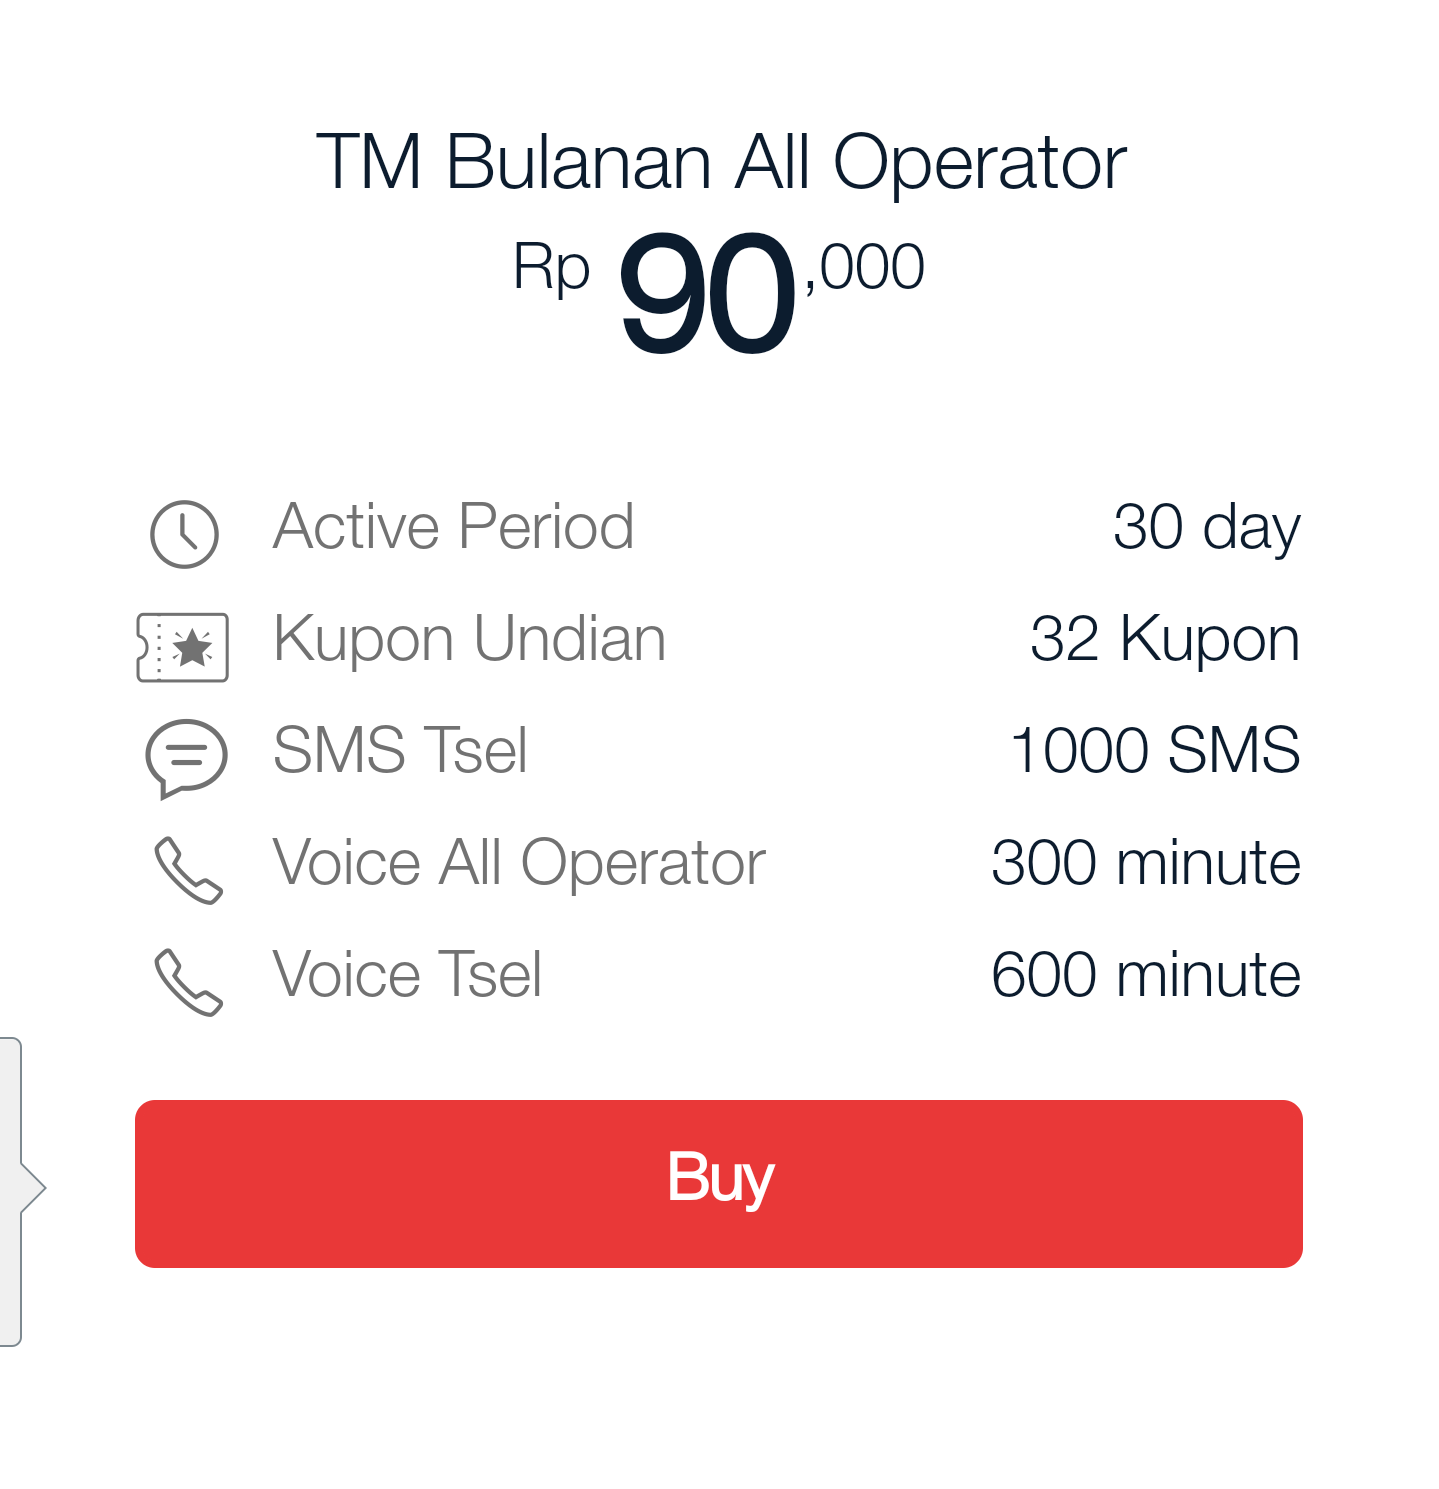 TM Bulanan All Operator